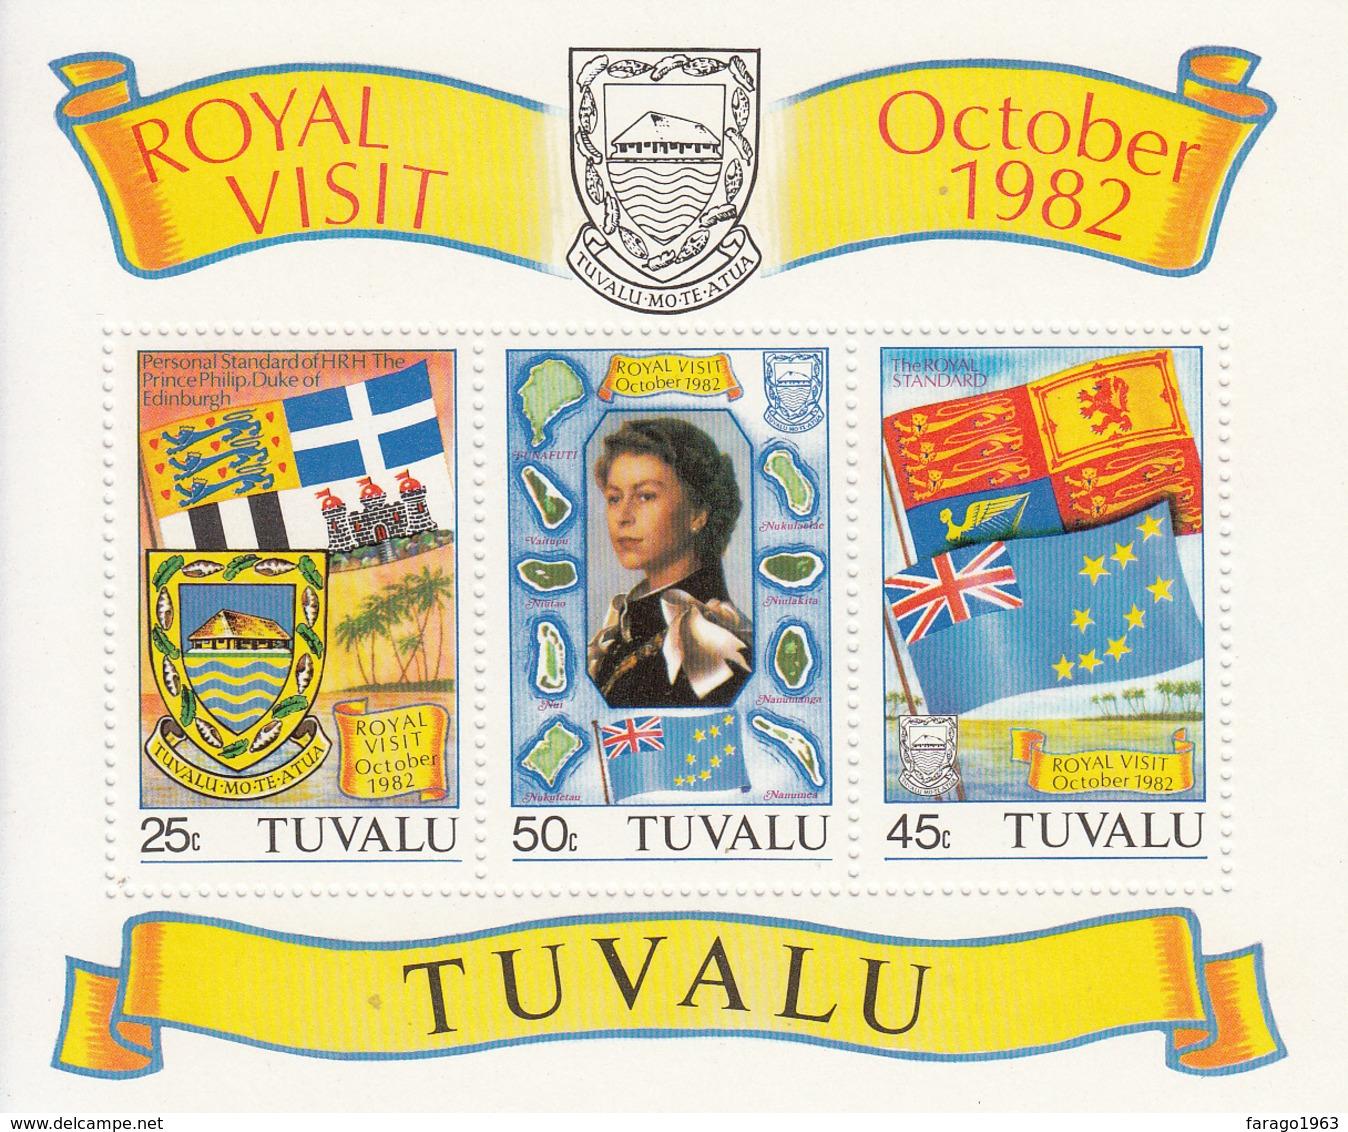 1982 Tuvalu QE Royal Visit Flags Coats Of Arms Miniature Sheet Of 3 MNH - Tuvalu